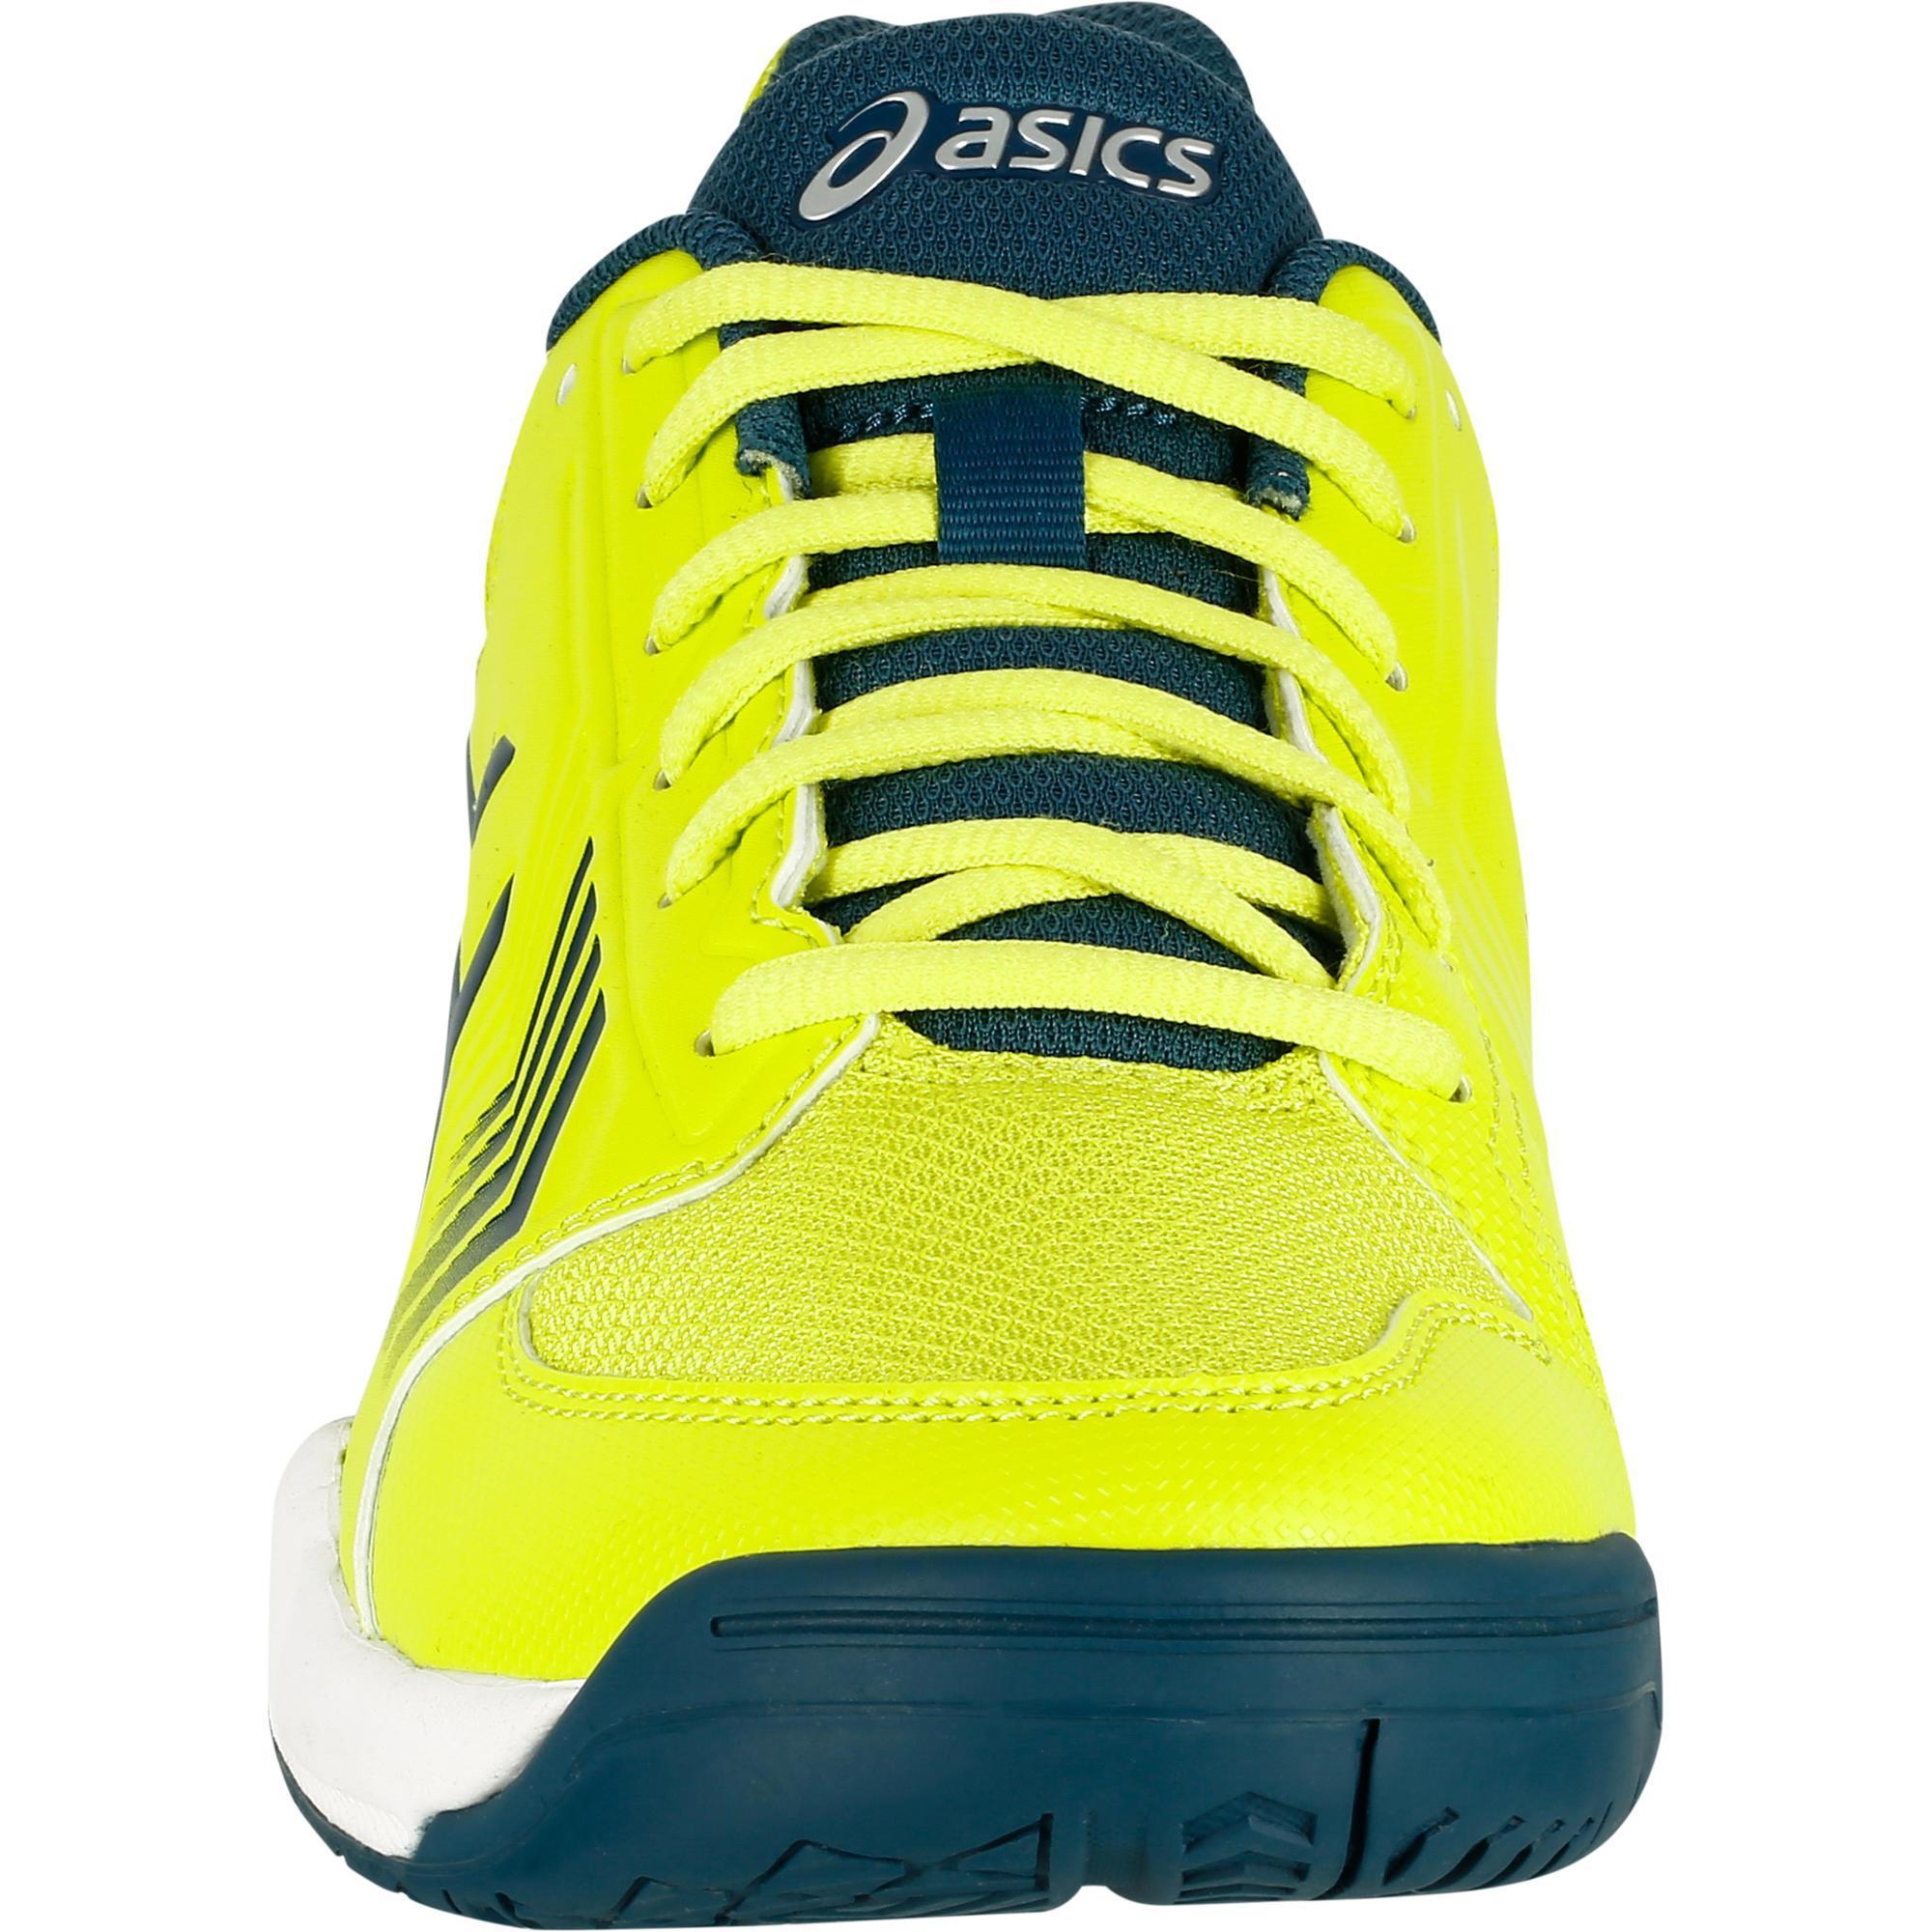 promo code 87322 53dc3 Gel Chaussure Tennis Homme Asics De Decathlon Jaune Uwyqw Dedicate qB1tRR